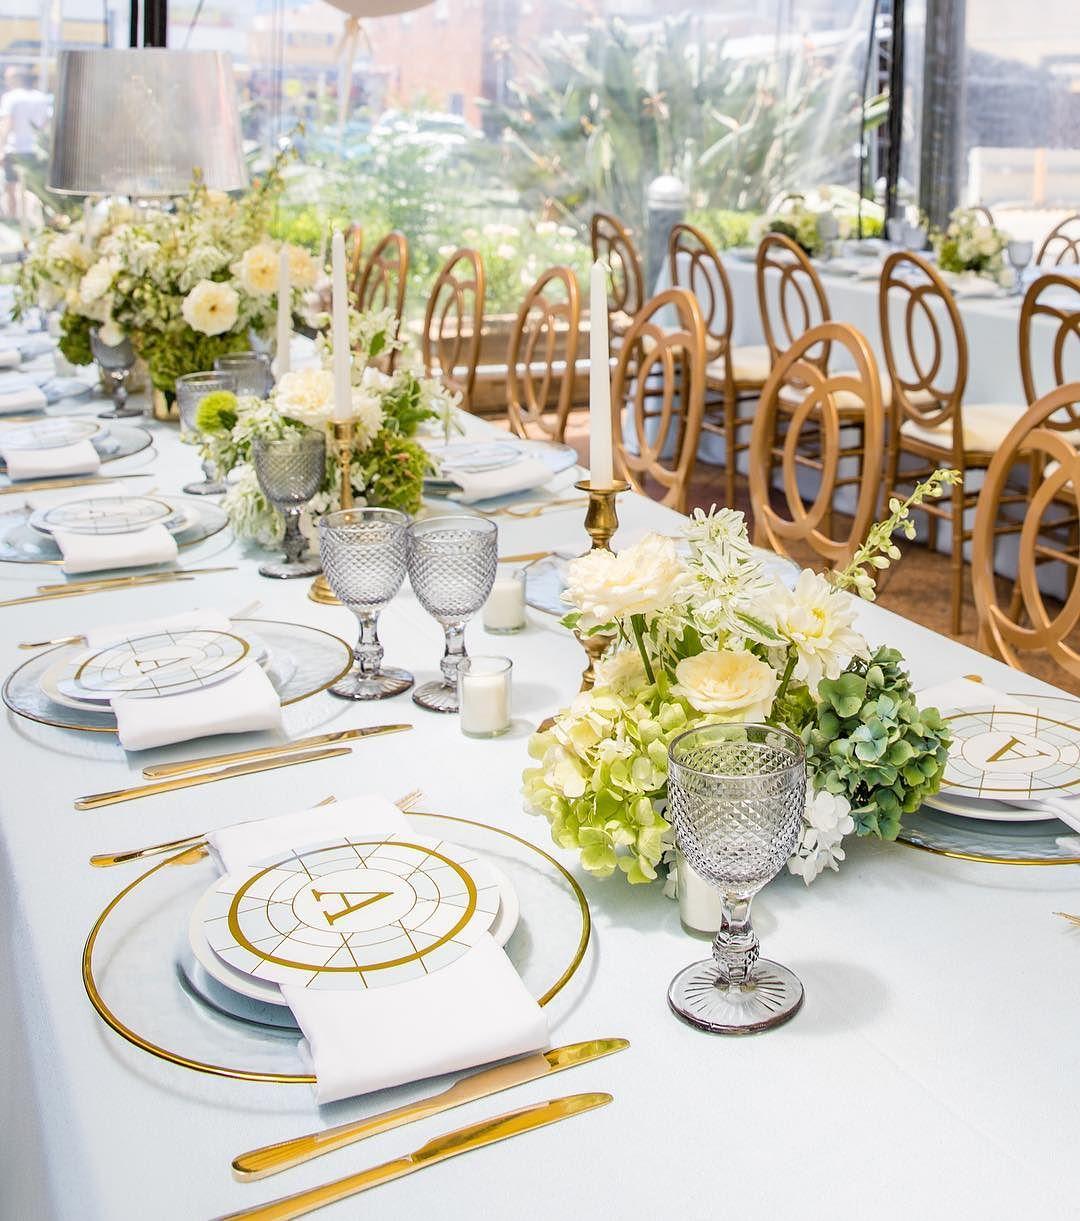 sillas para decorar eventos 2018 (4)